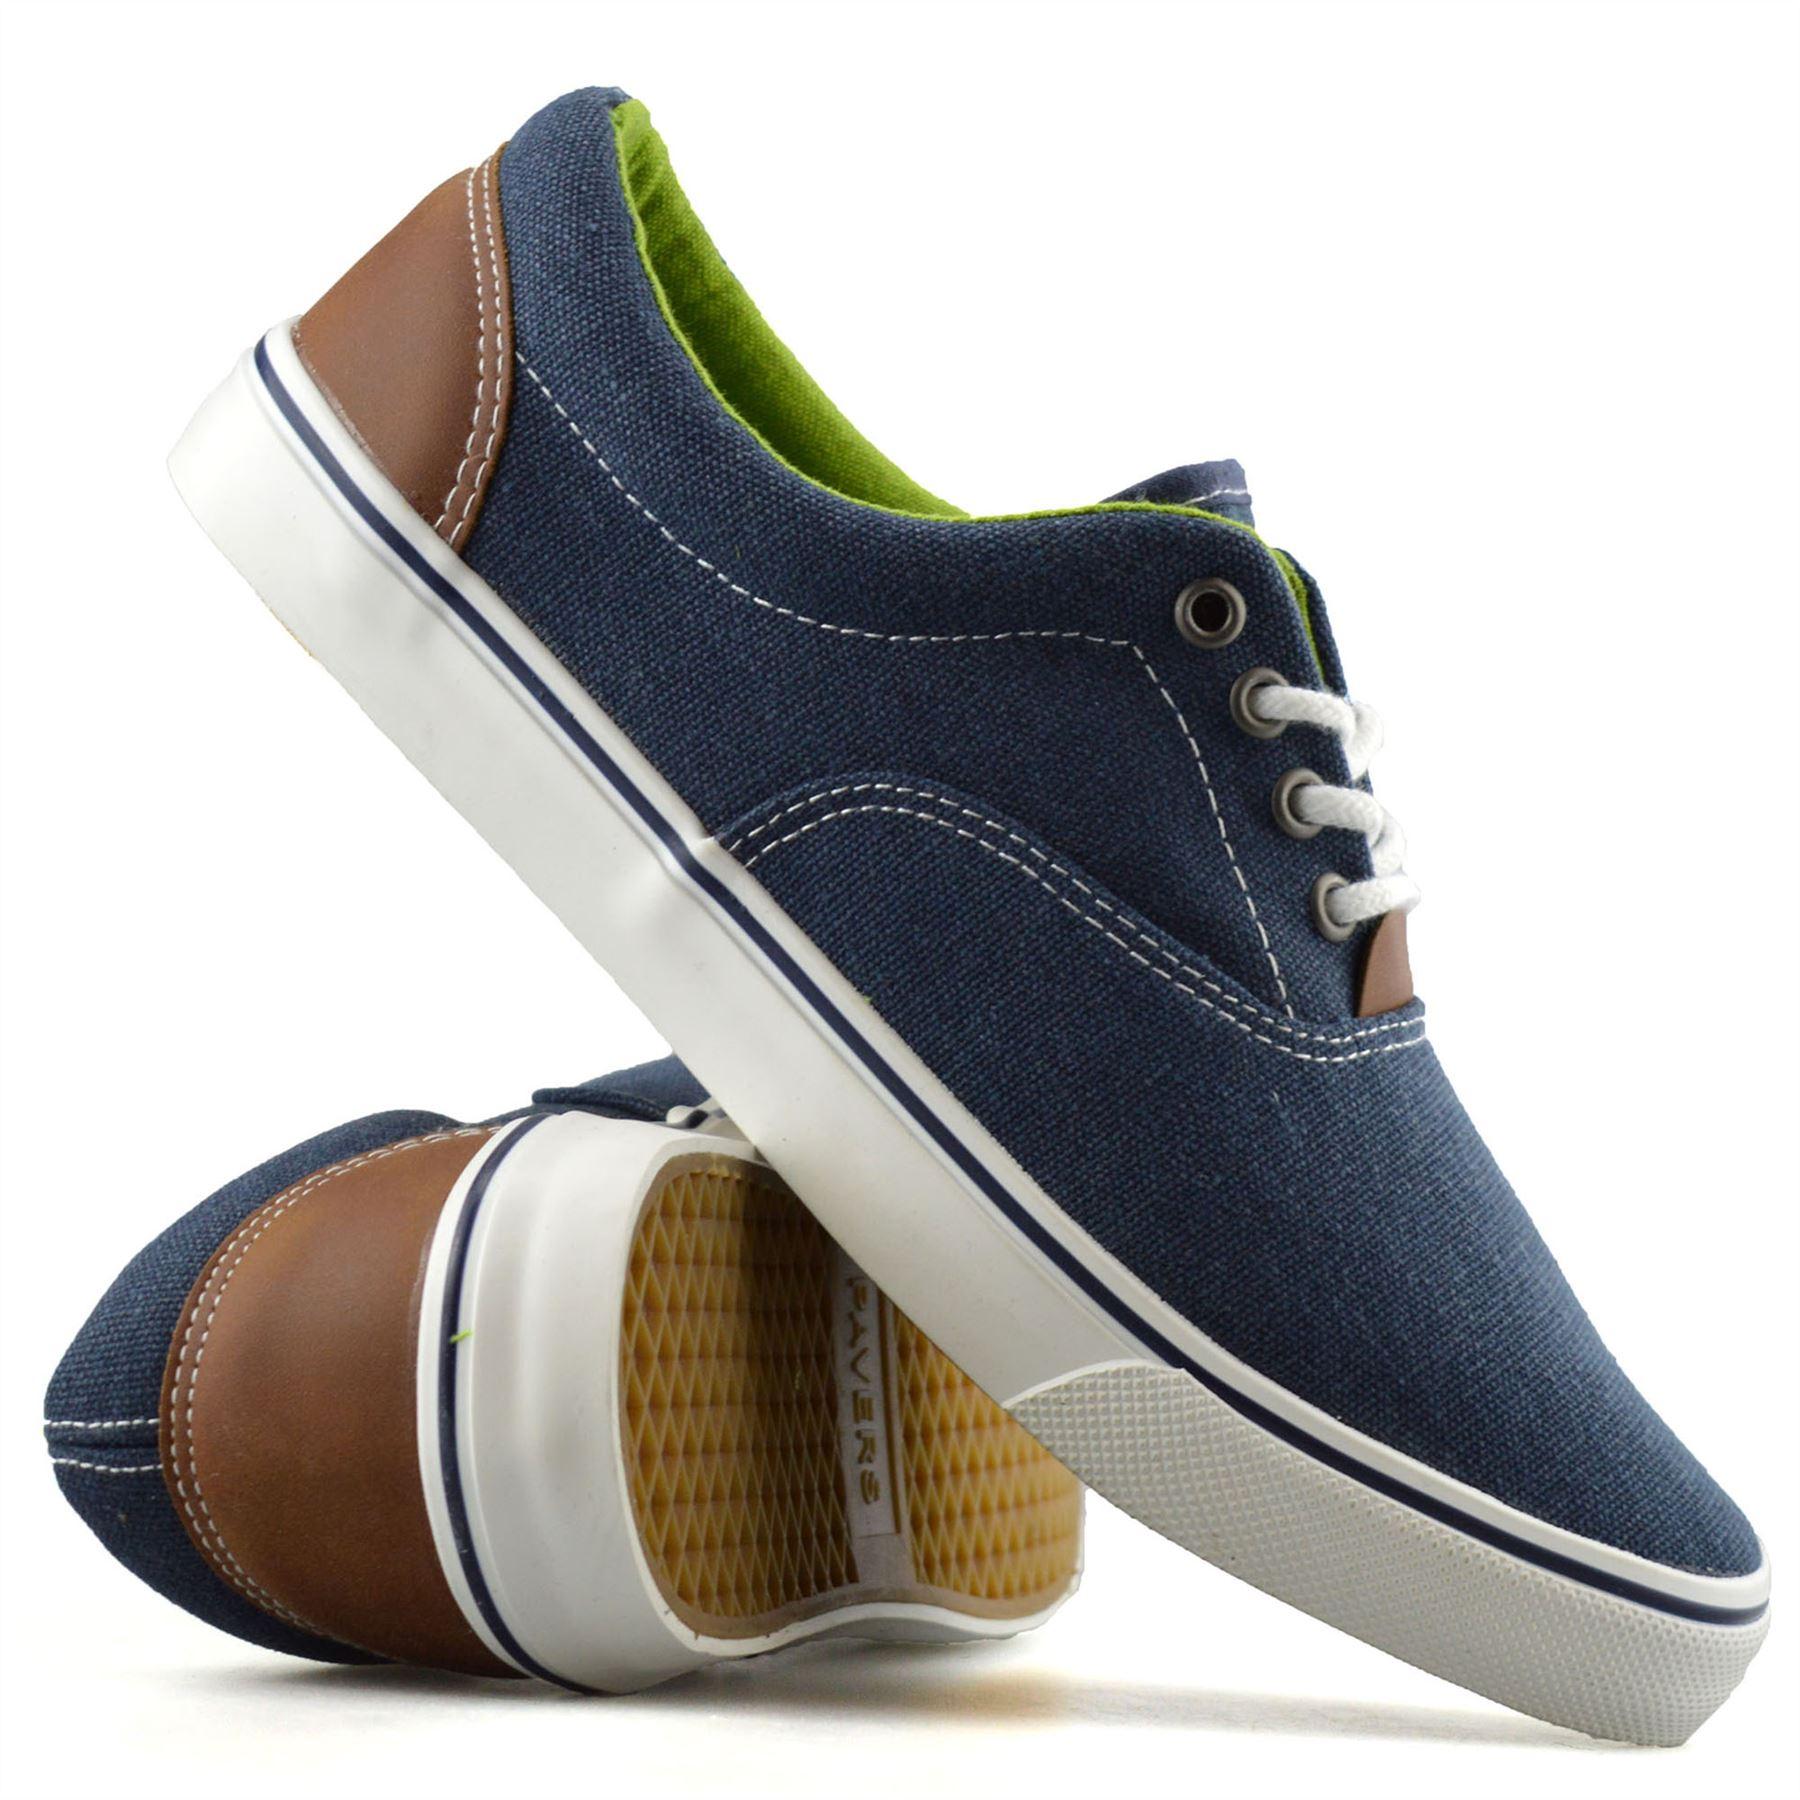 Mens-Casual-Flat-Lace-Up-Canvas-Skate-Pumps-Walking-Plimsolls-Trainers-Shoe-Size thumbnail 16